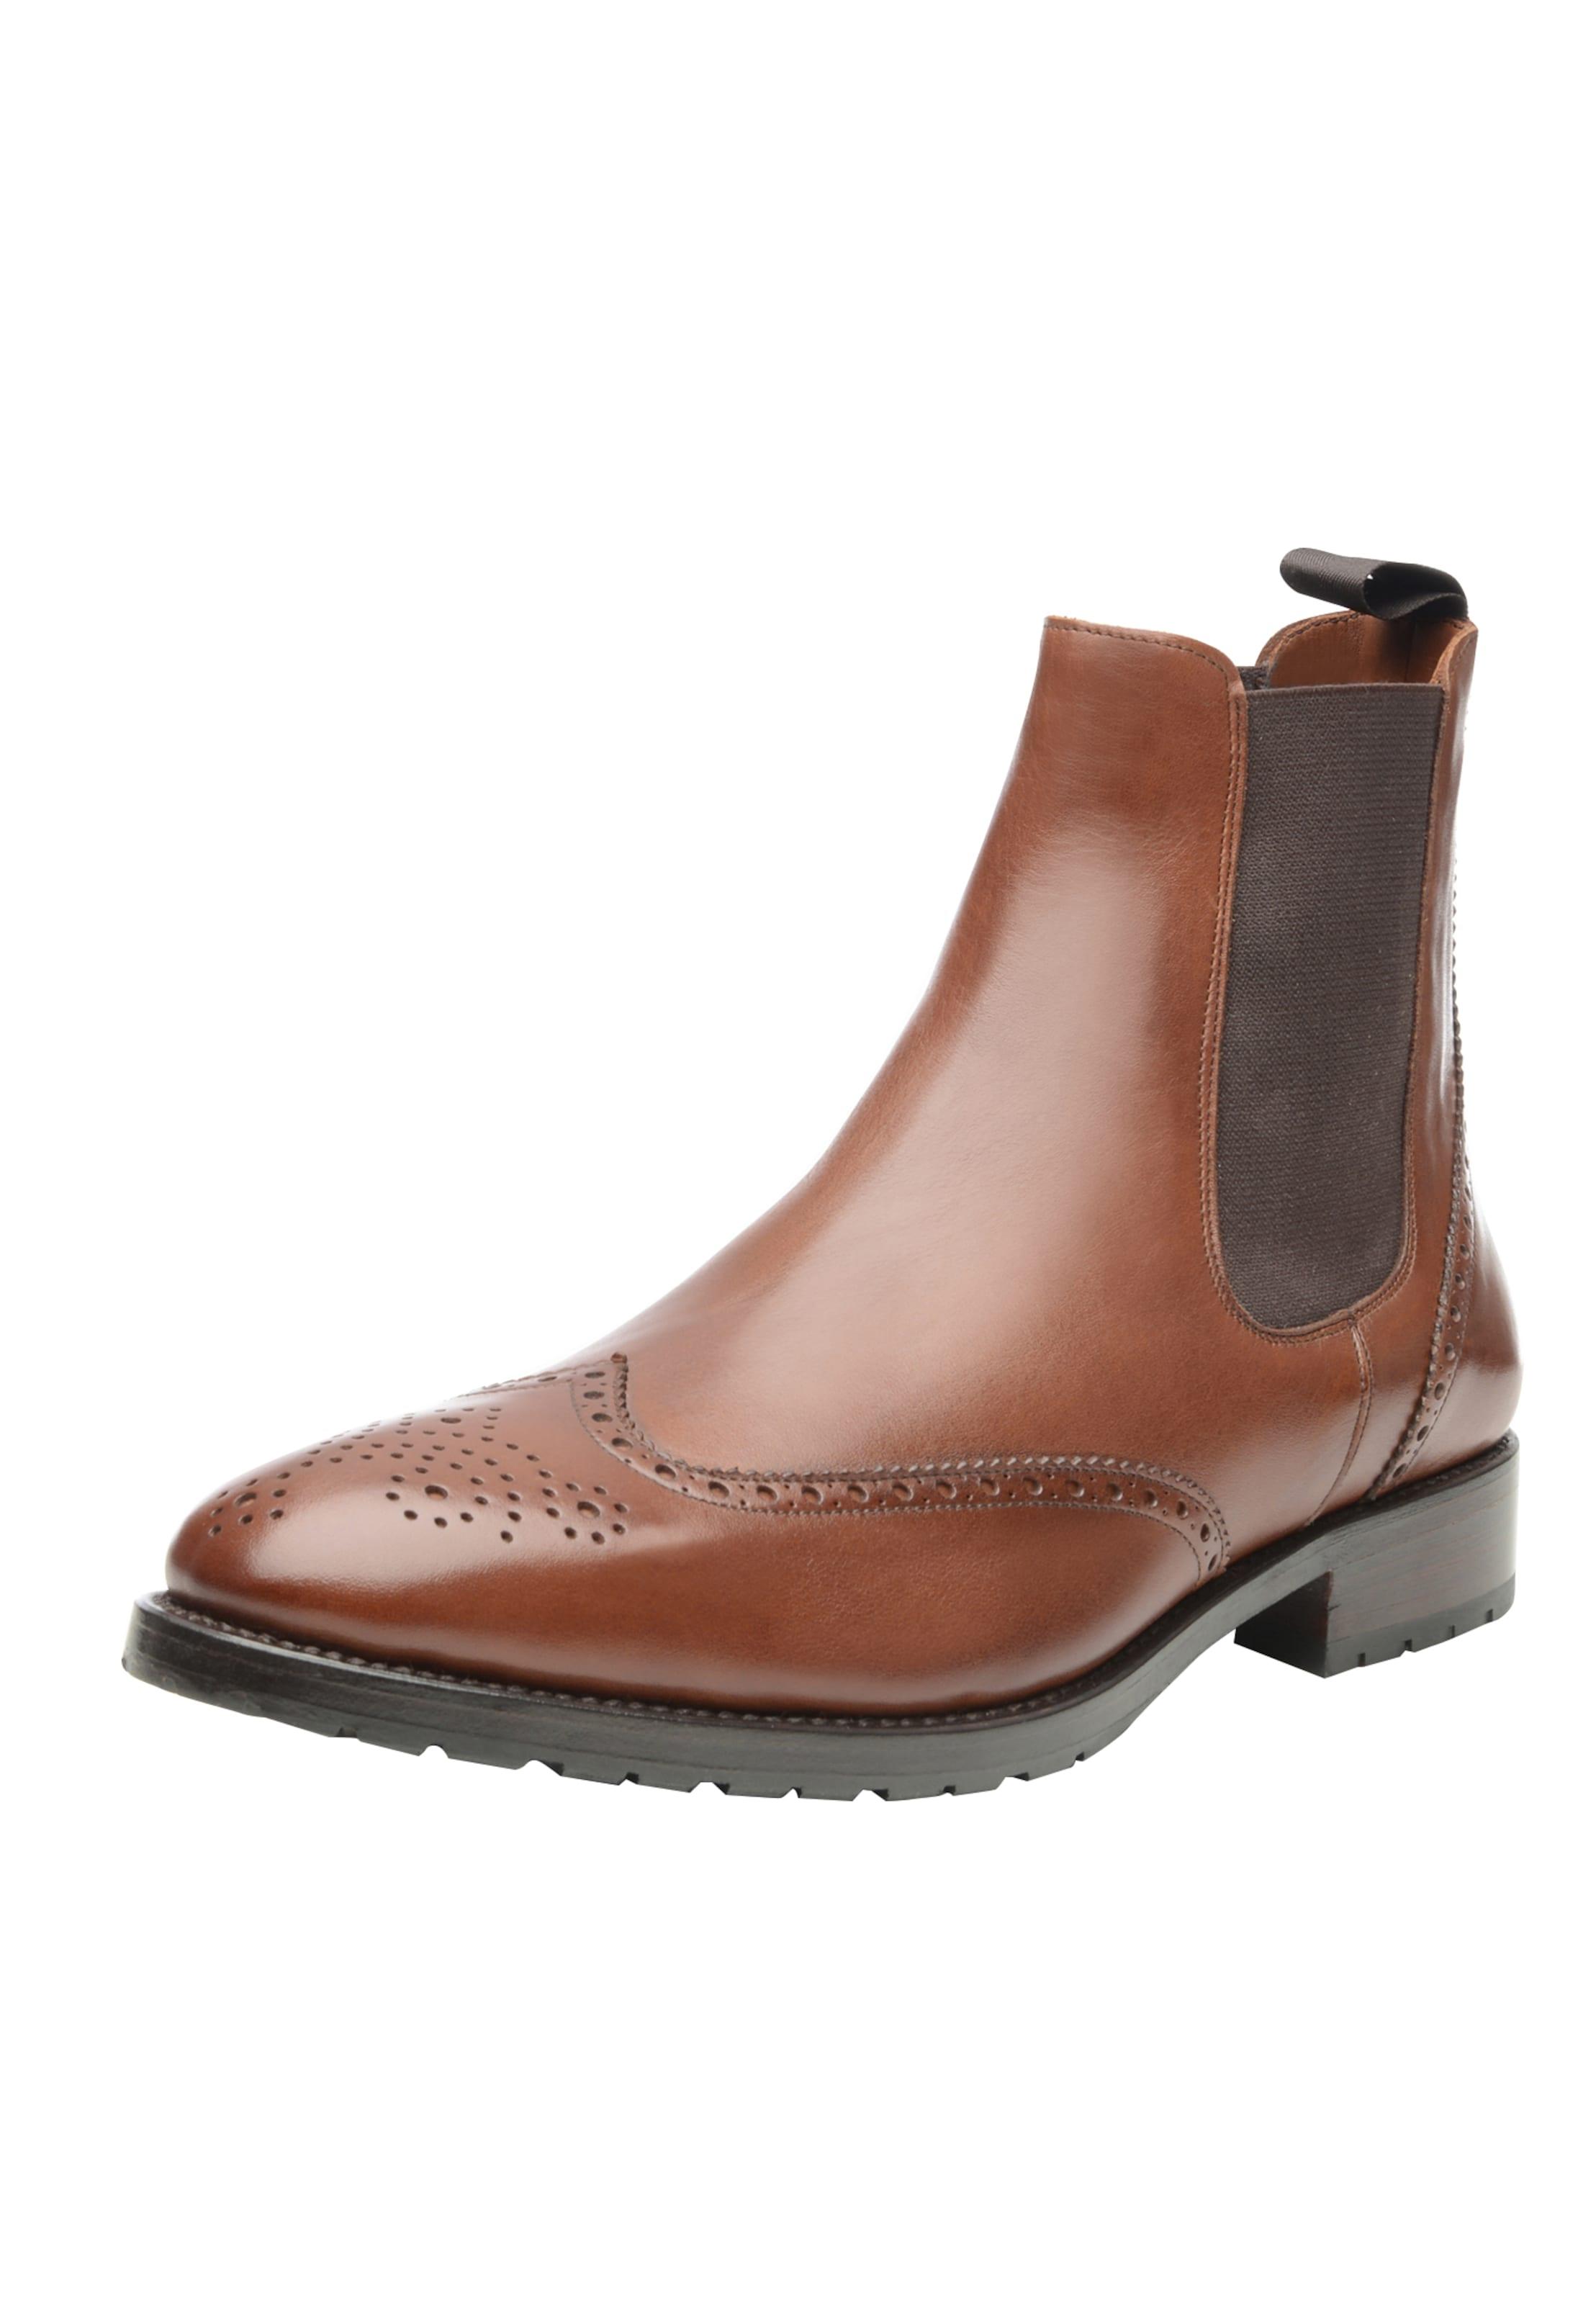 SHOEPASSION Winterboots No. 681 Verschleißfeste billige Schuhe